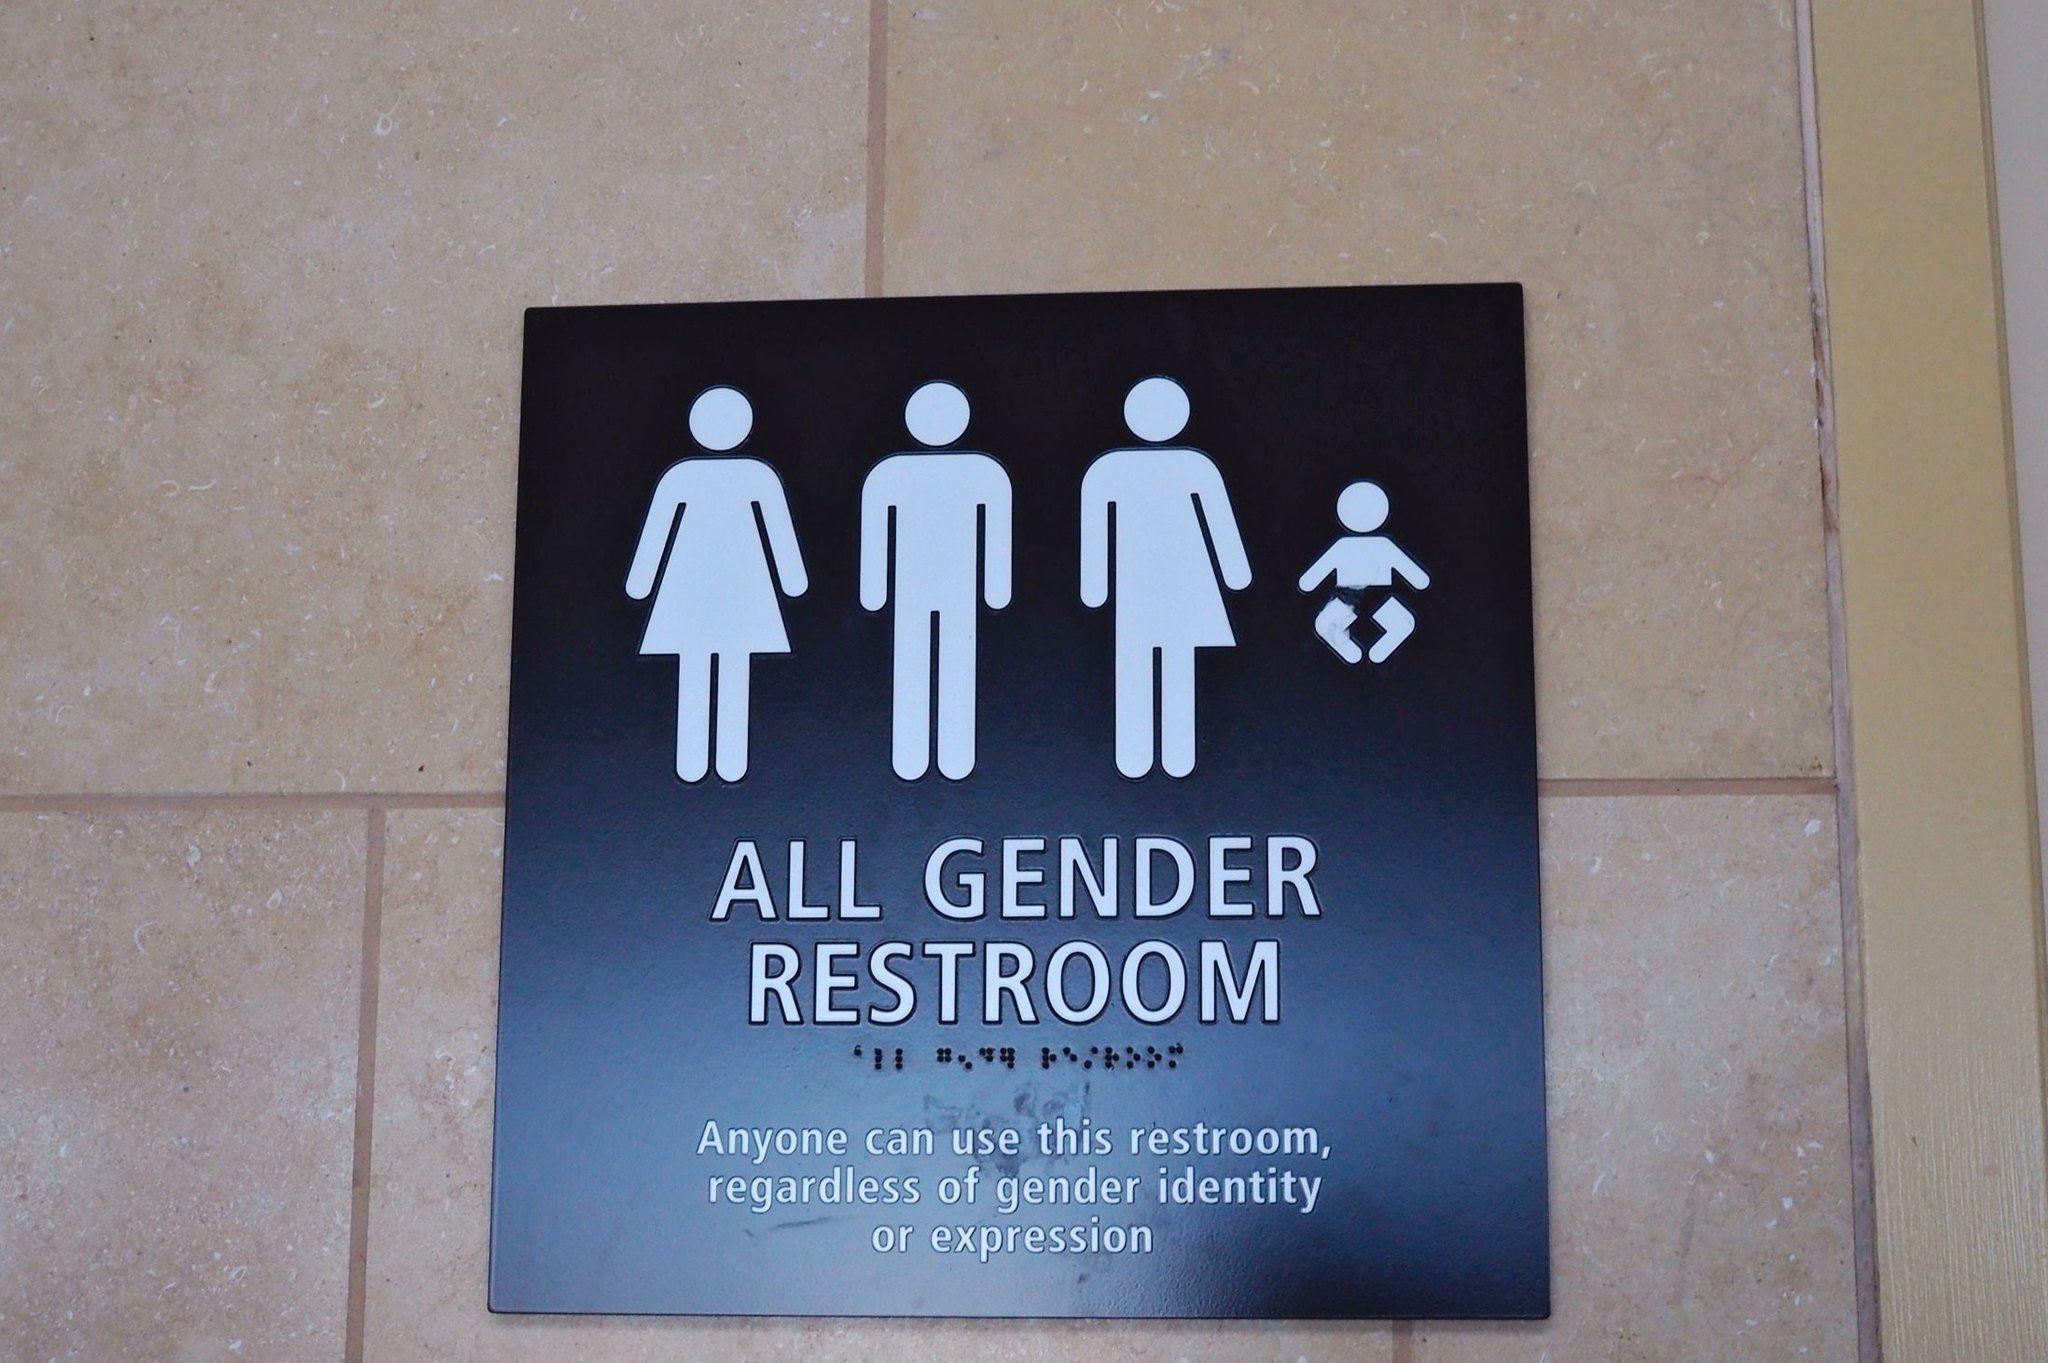 Transgender Bathroom Suit Hearing Today Tuberculosis Testing At - Transgender bathrooms in schools